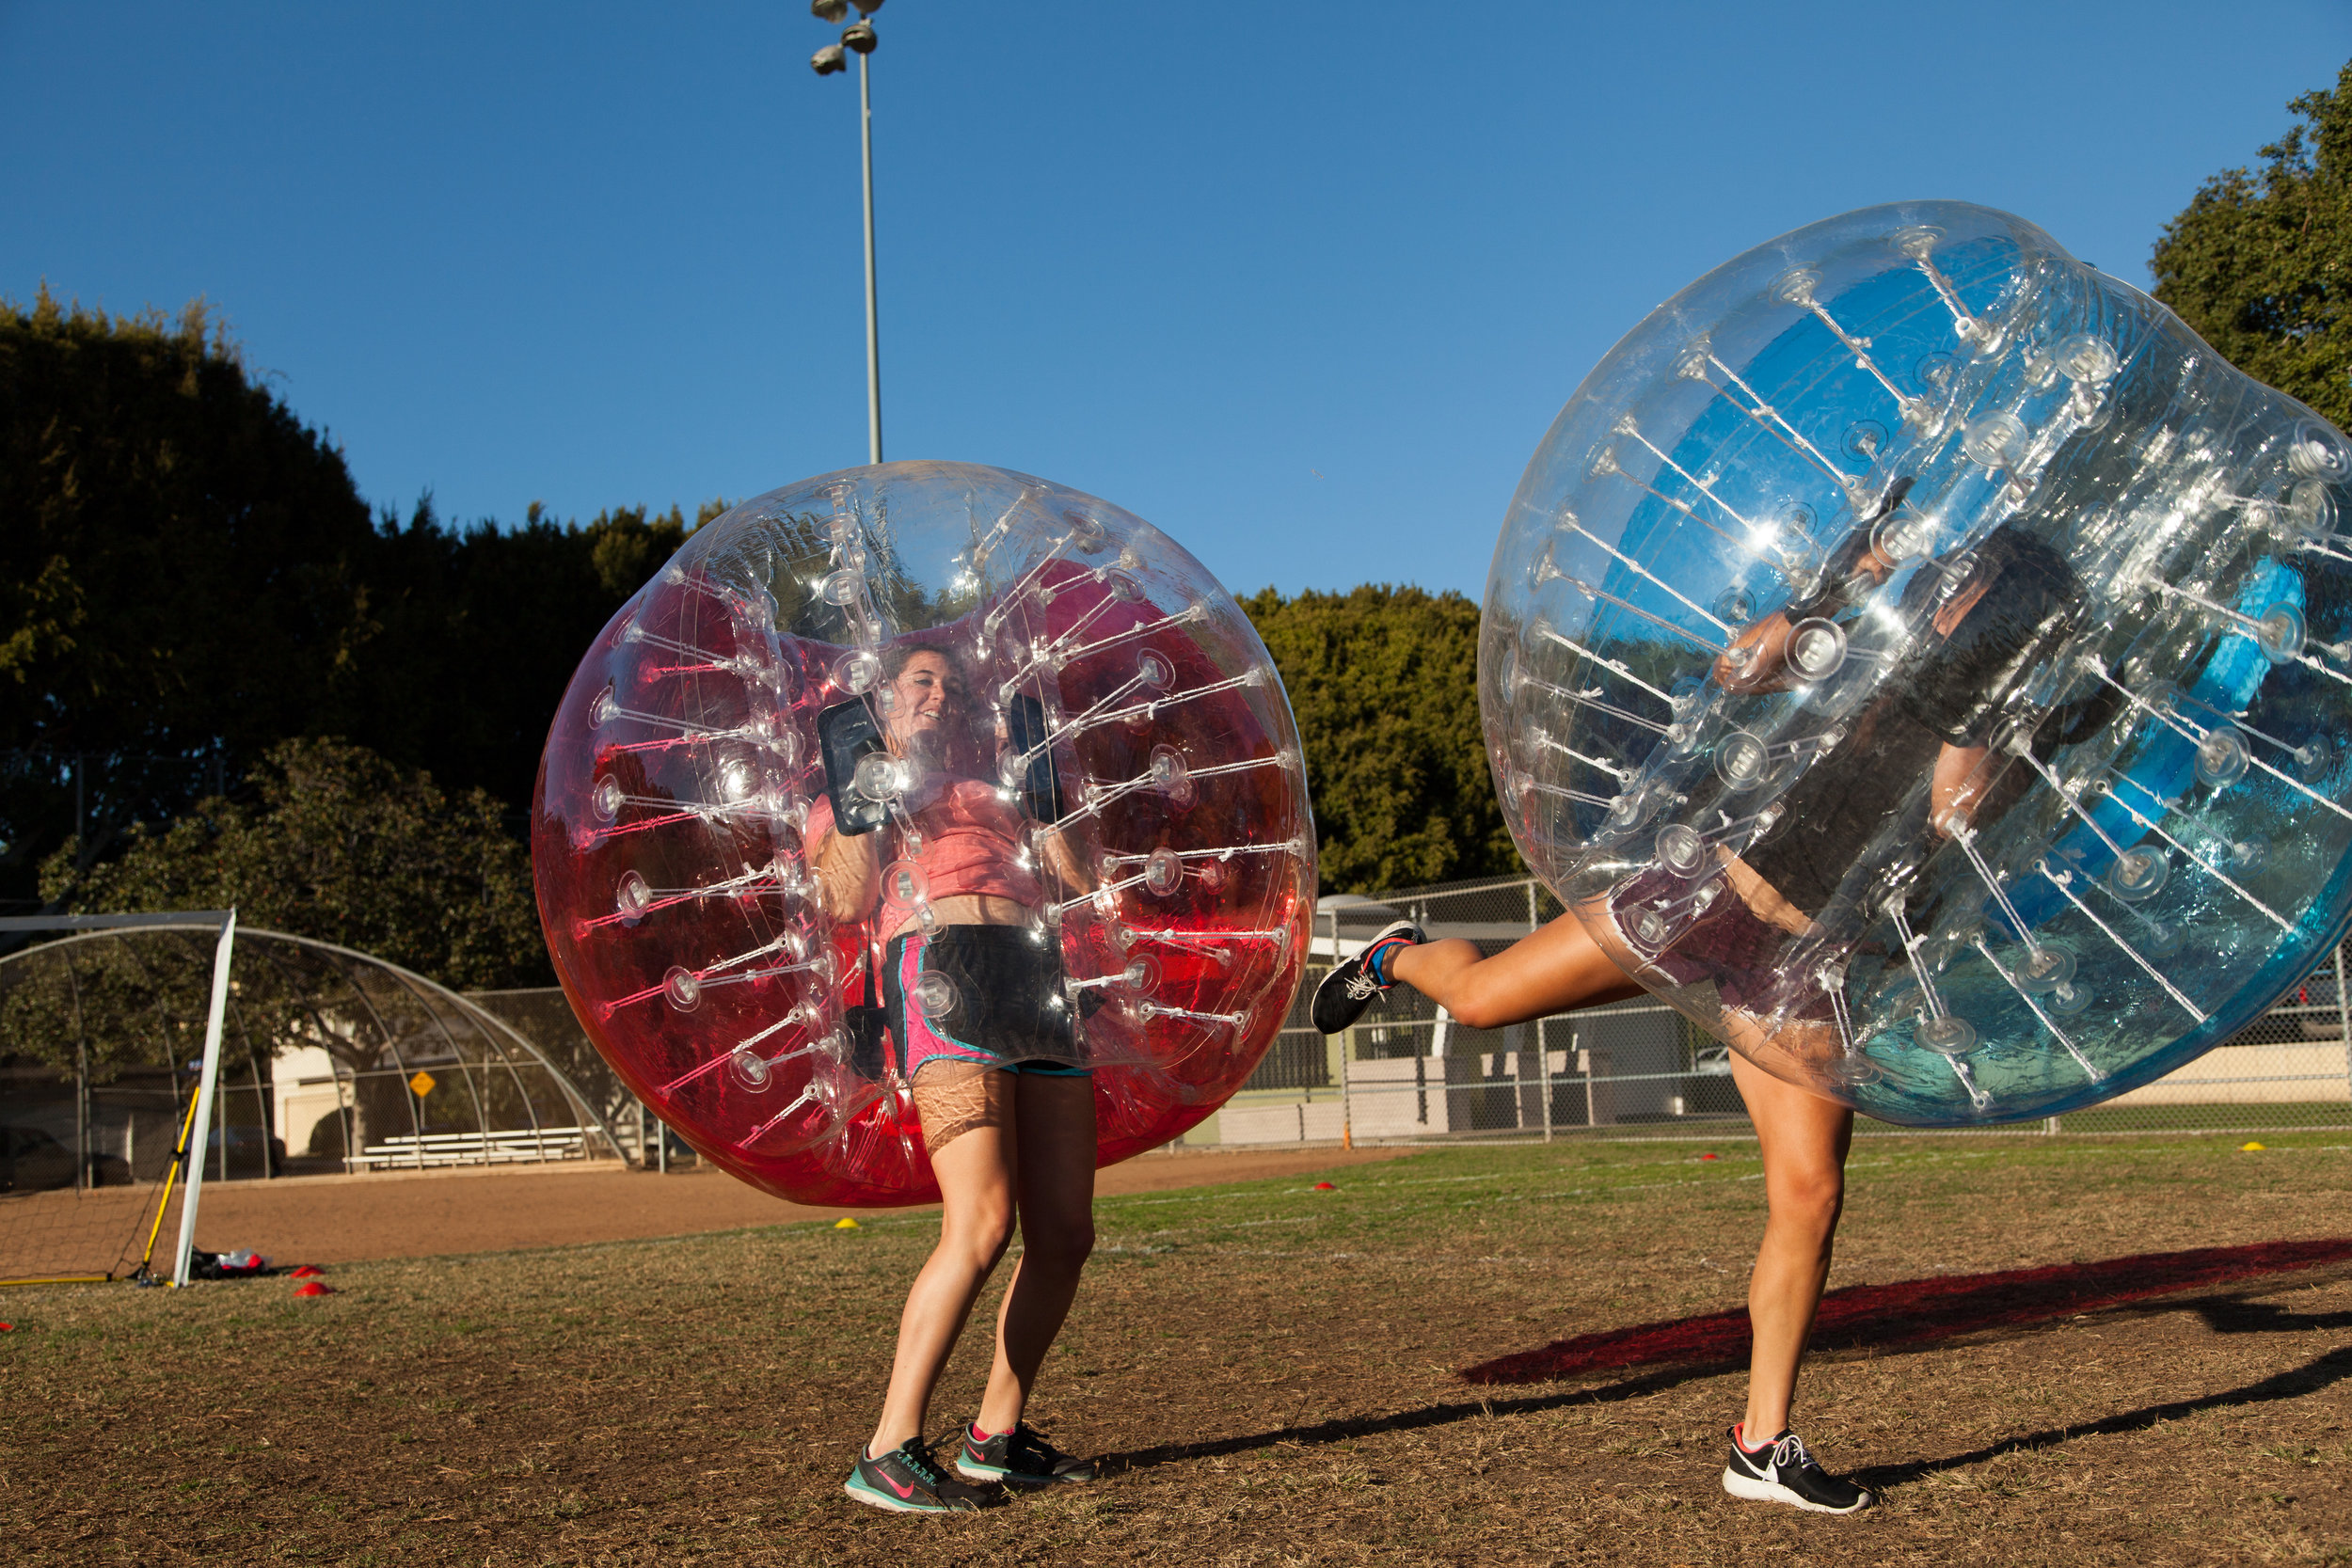 Big bump girls rent bubble soccer party Hermosa Beach